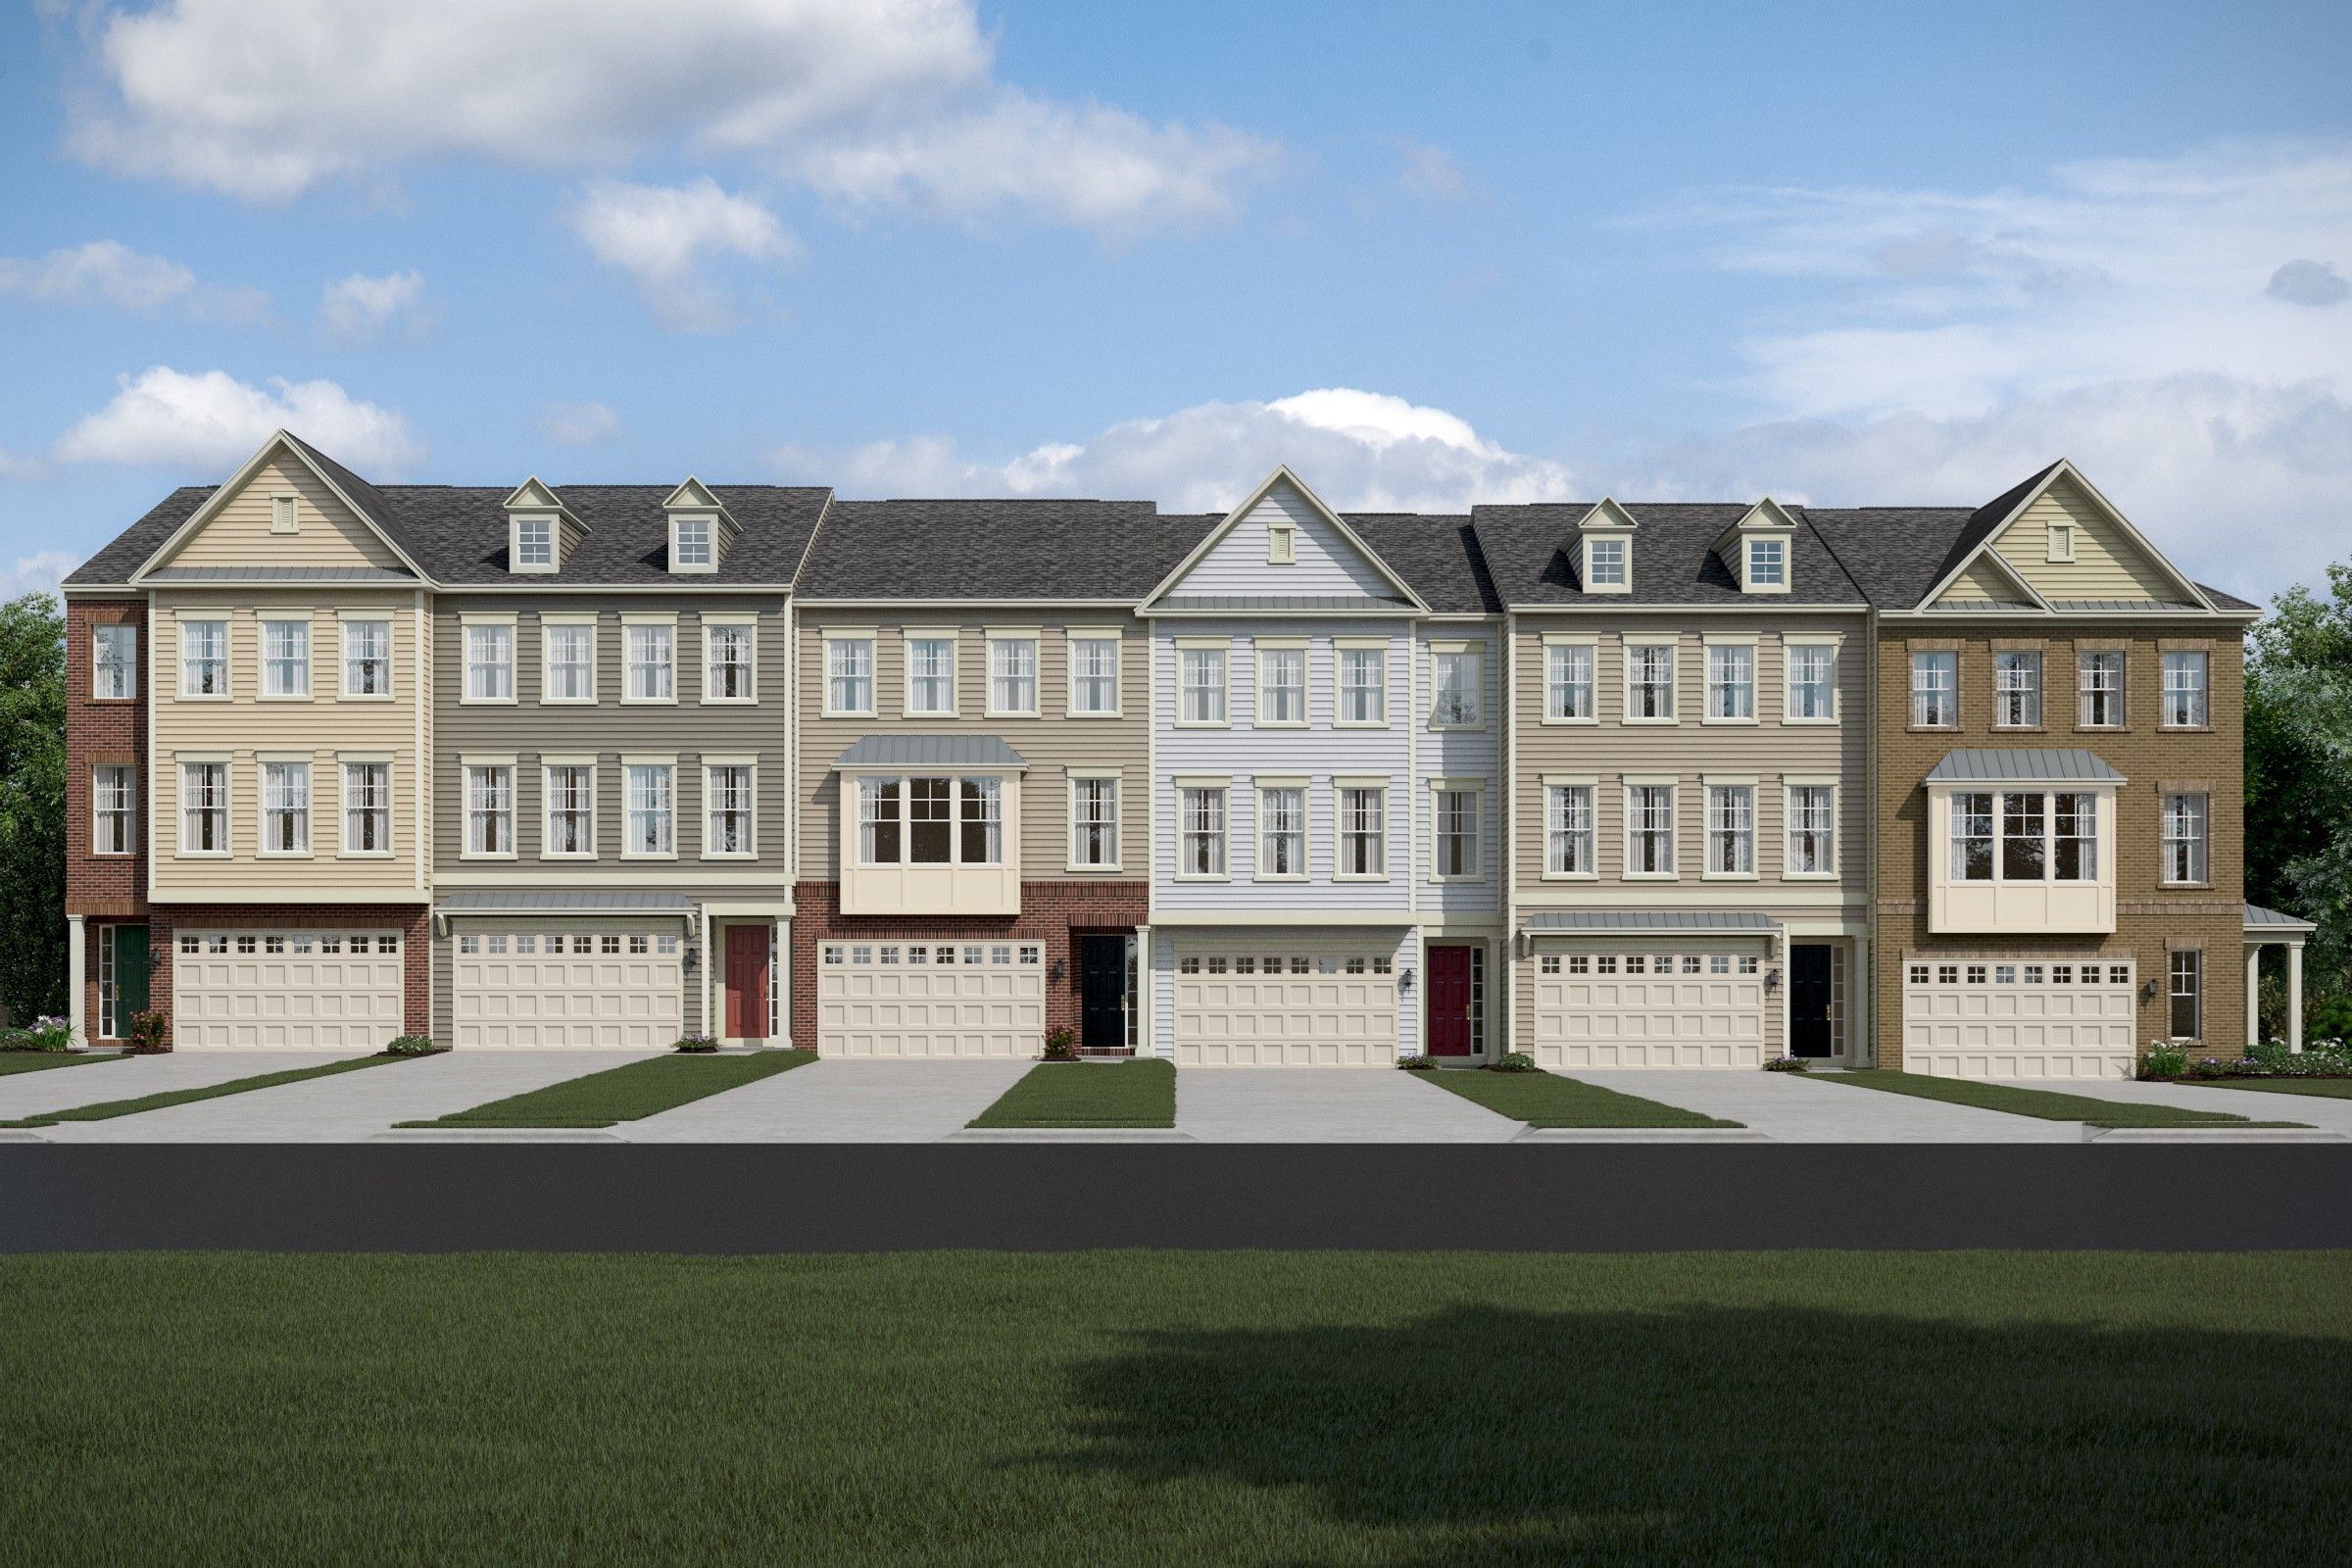 5 Enclave Court, Homesite 22, Annapolis, MD Homes & Land - Real Estate